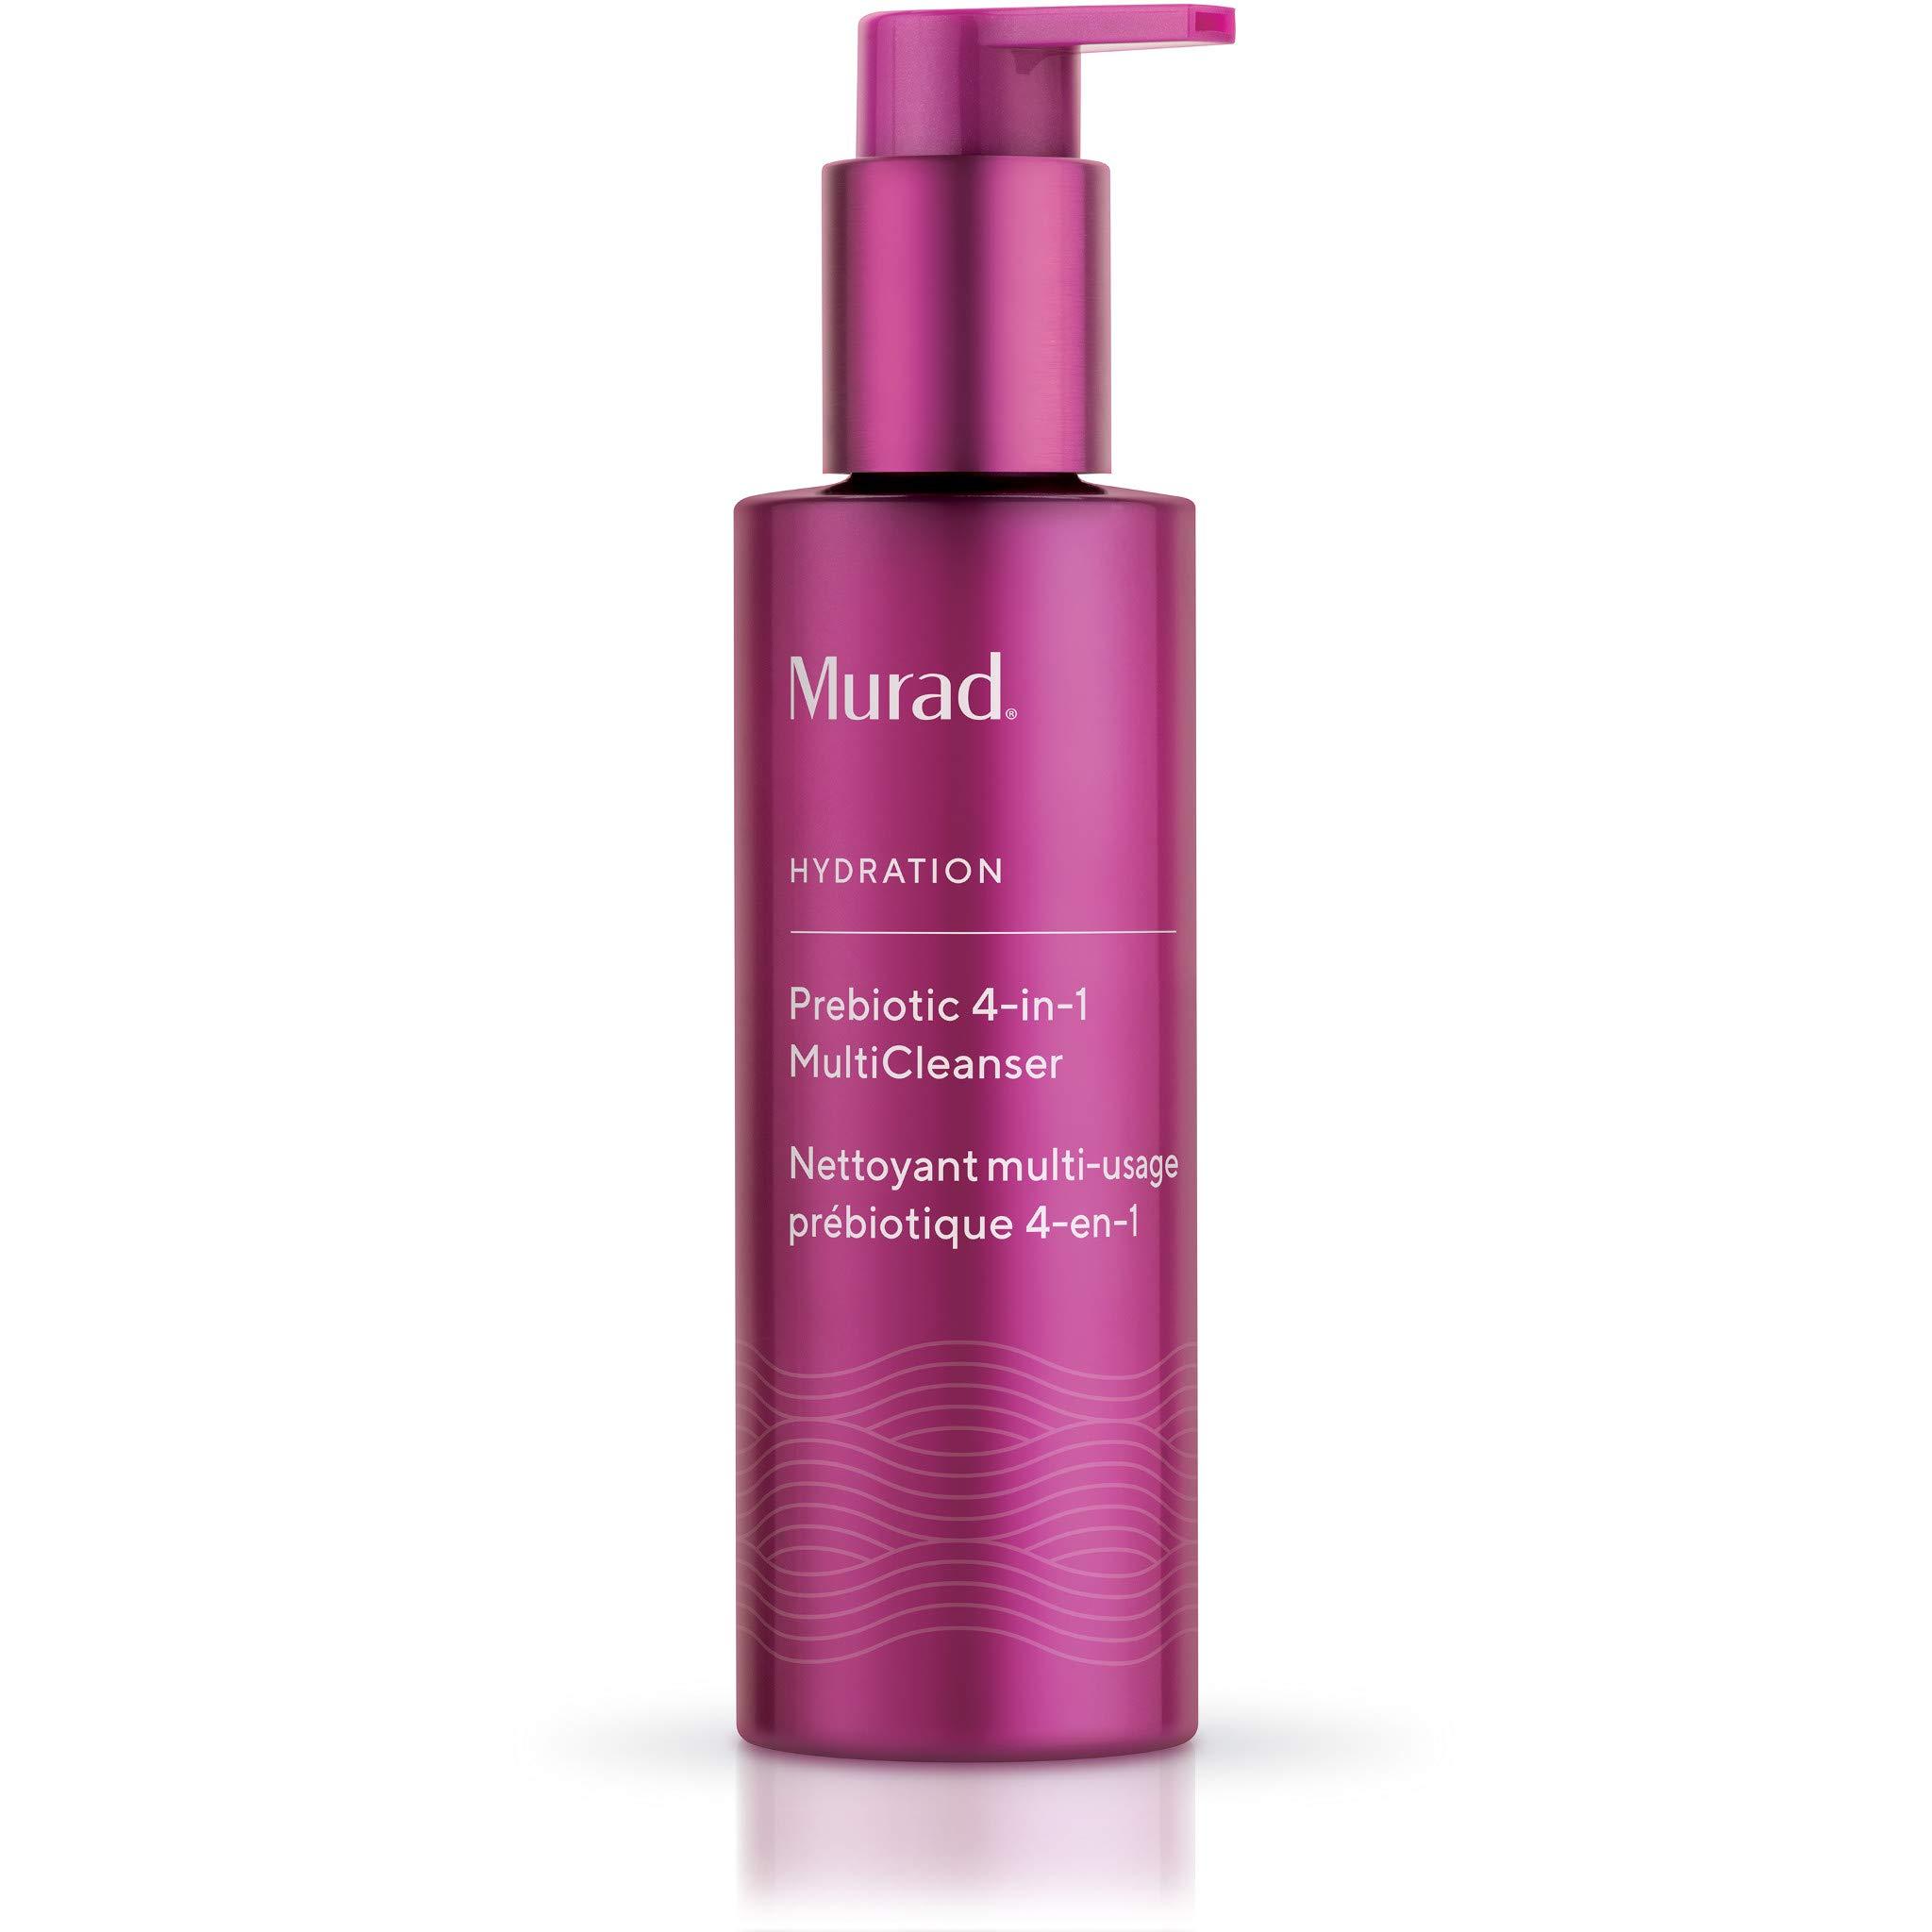 Murad Prebiotic 4-in-1 MultiCleanser